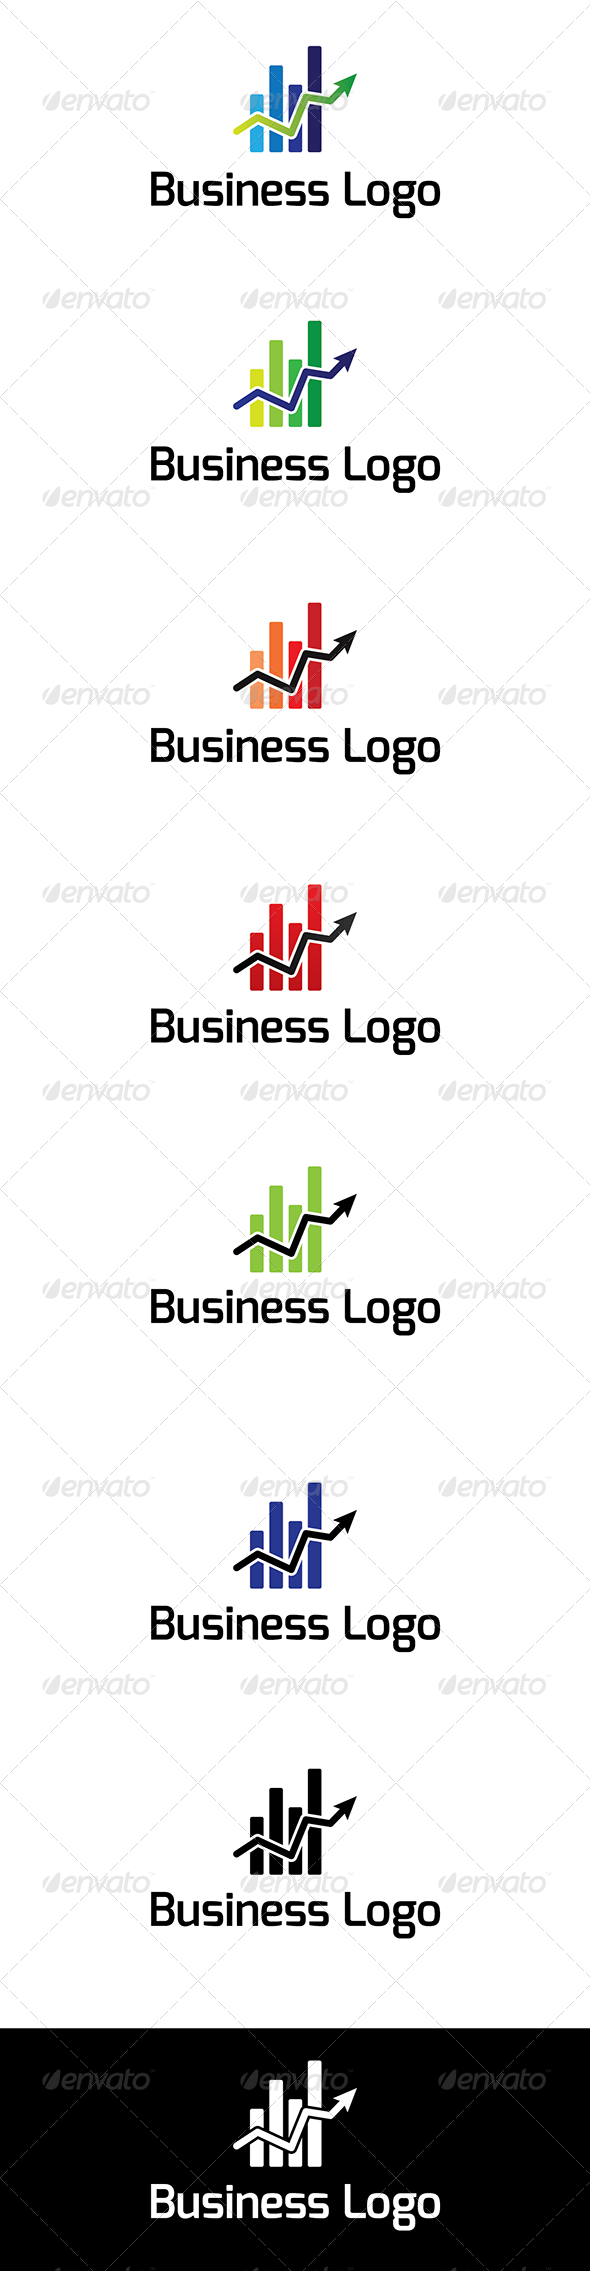 Business Logo - Logo Templates